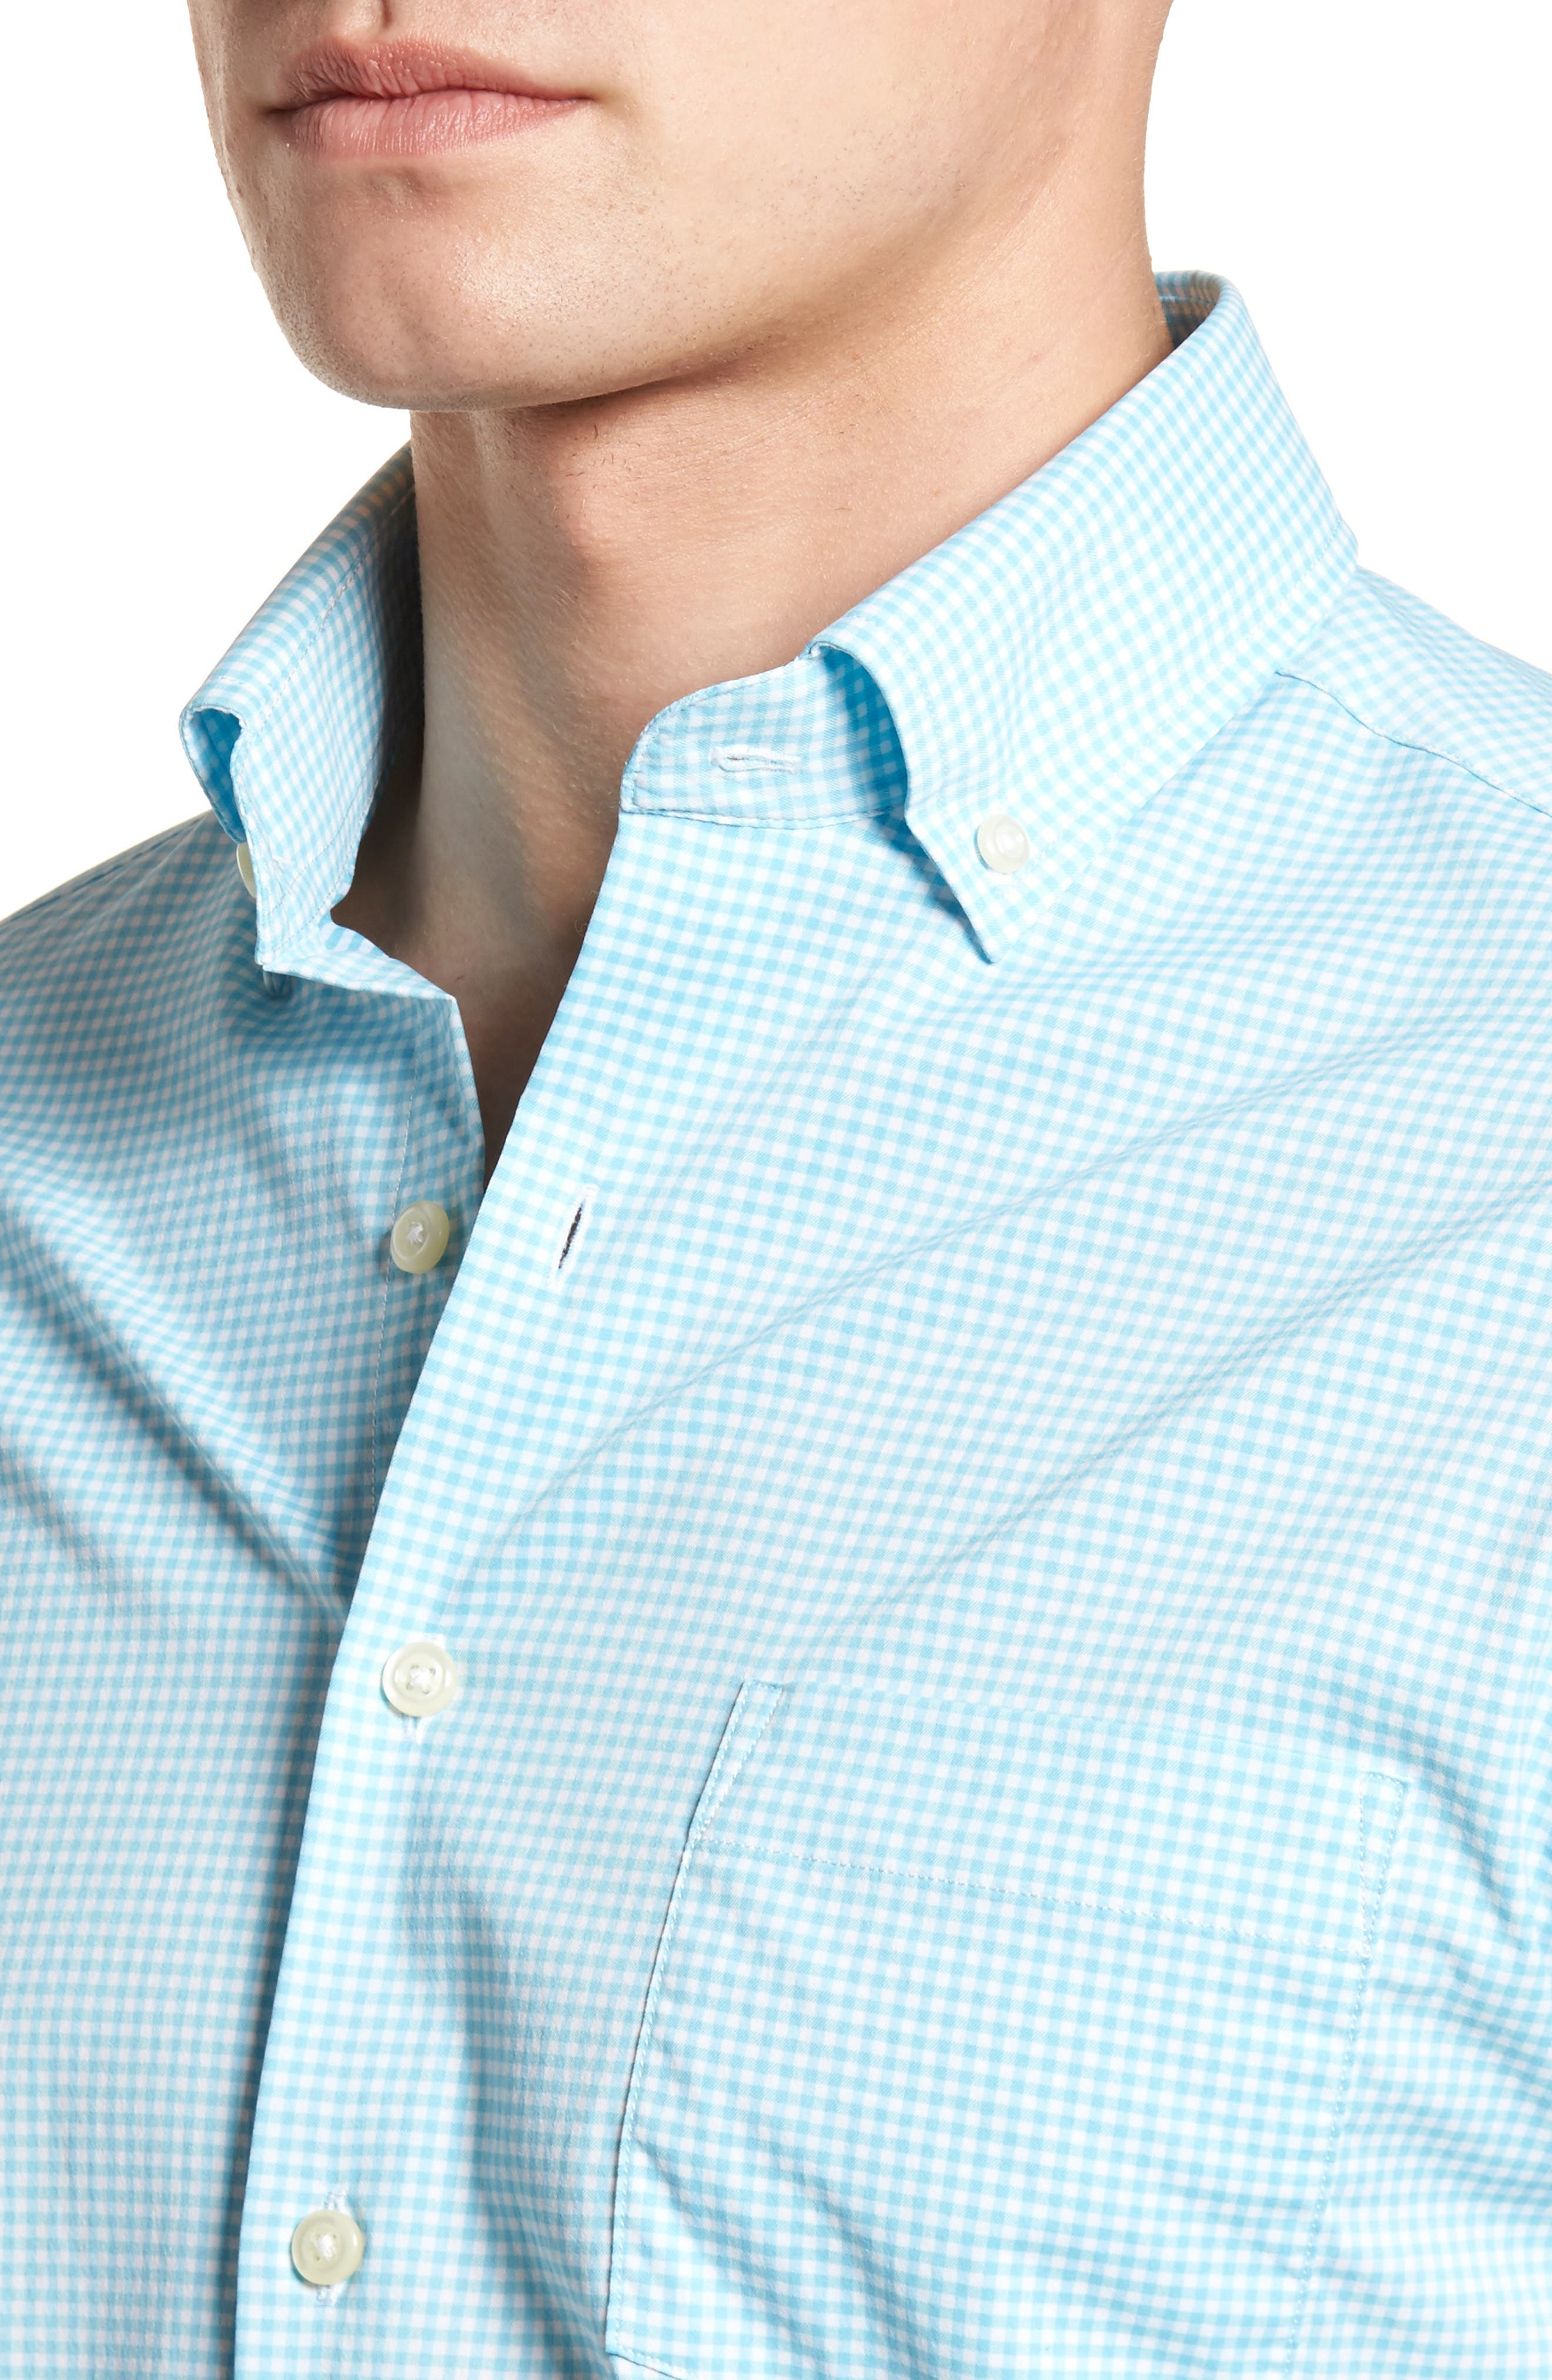 Mimi Regular Fit Check Performance Sport Shirt,                             Alternate thumbnail 4, color,                             Grotto Blue/ White